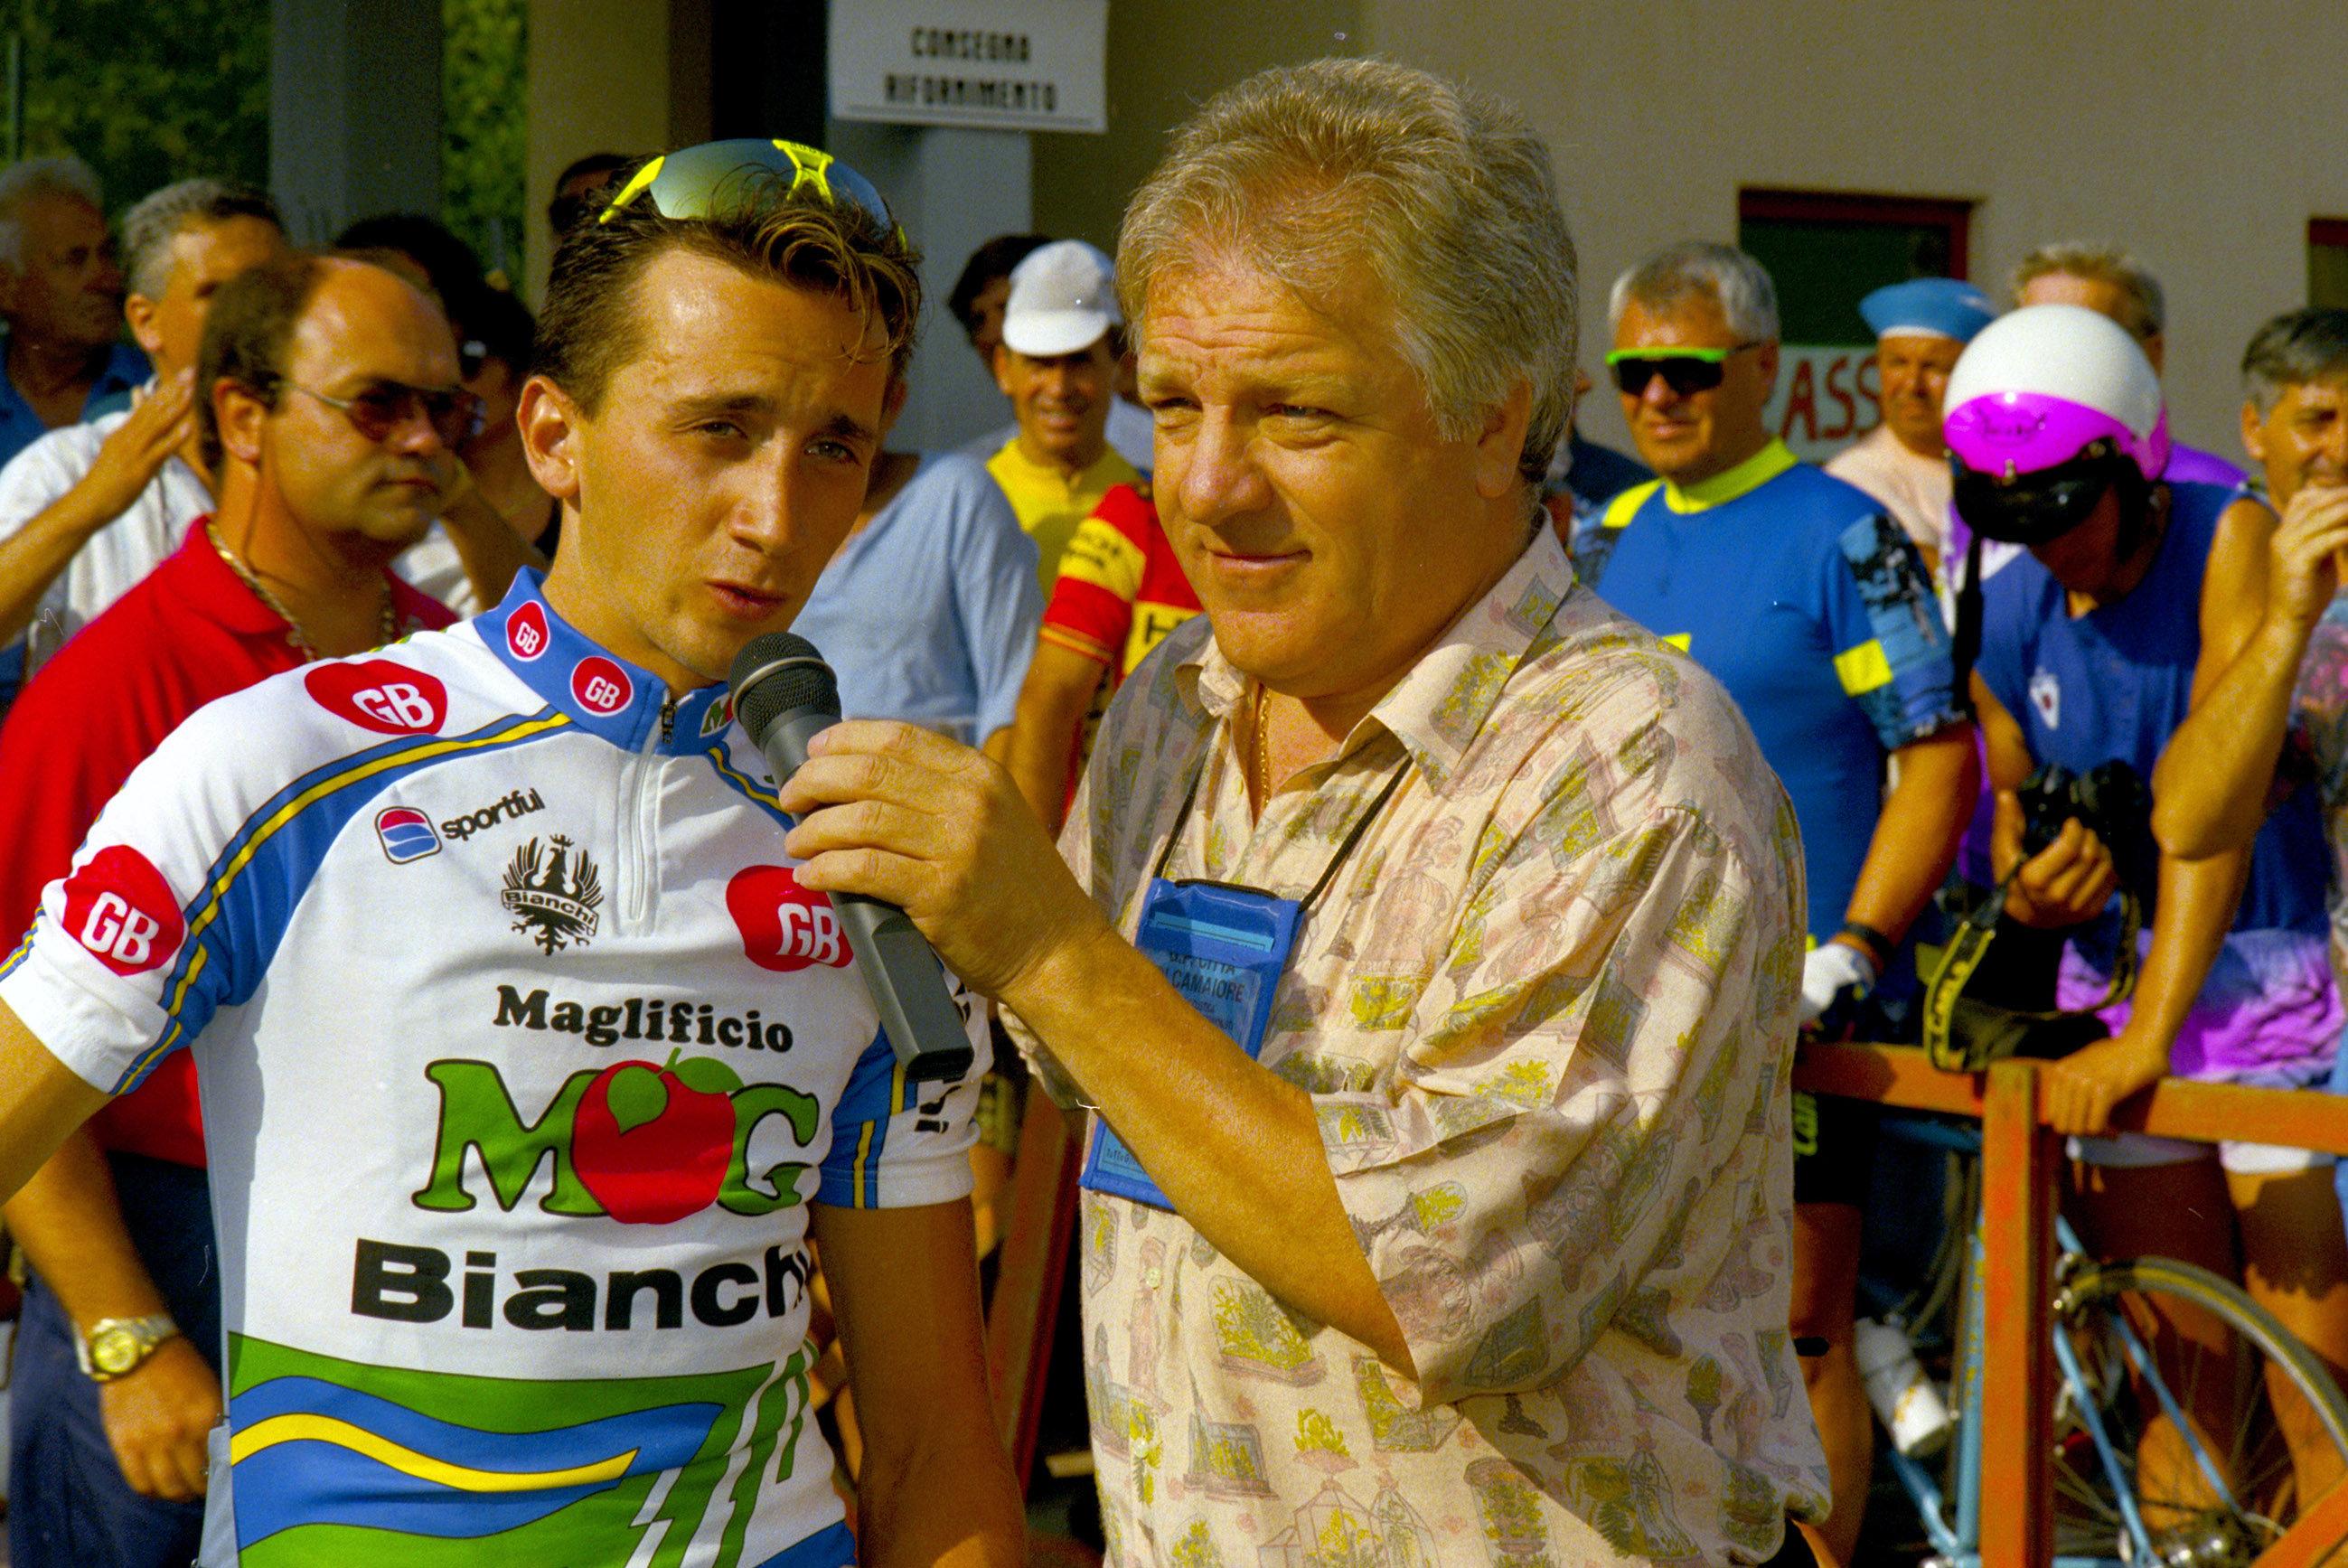 Davide Rebellin at the GP Camaiore in 1992.